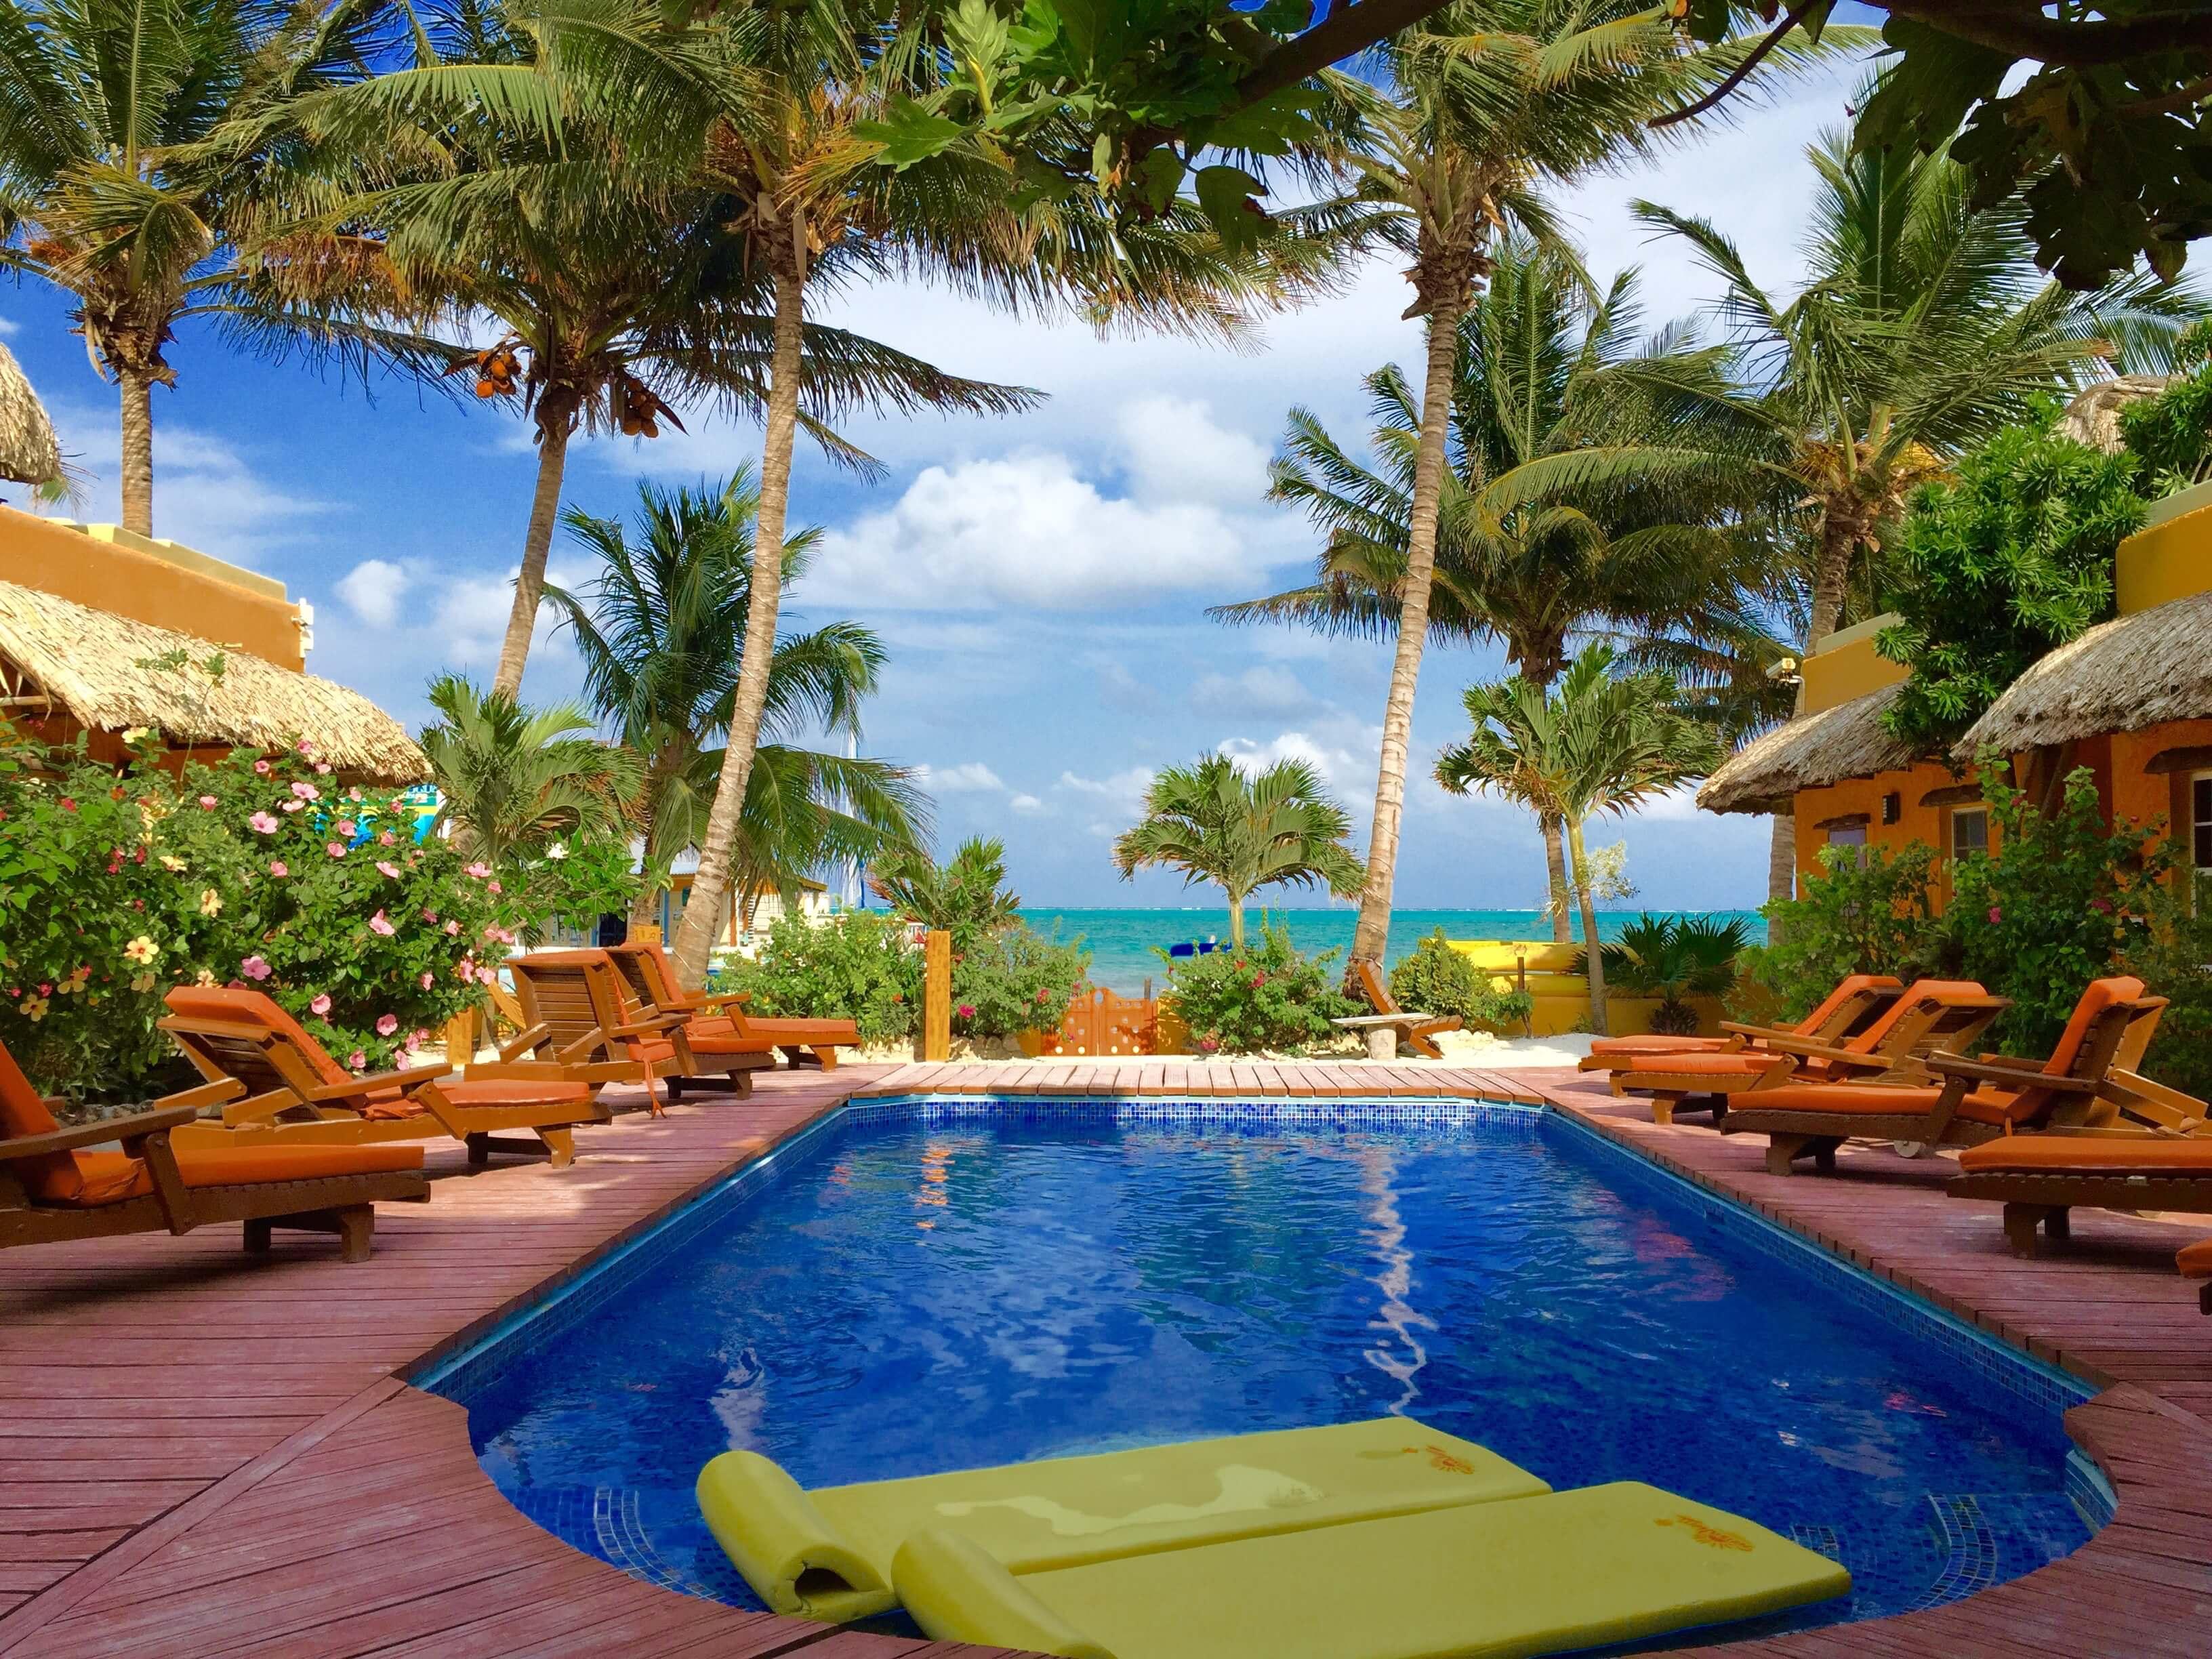 blog-you-better-belize-it-hotel-pool